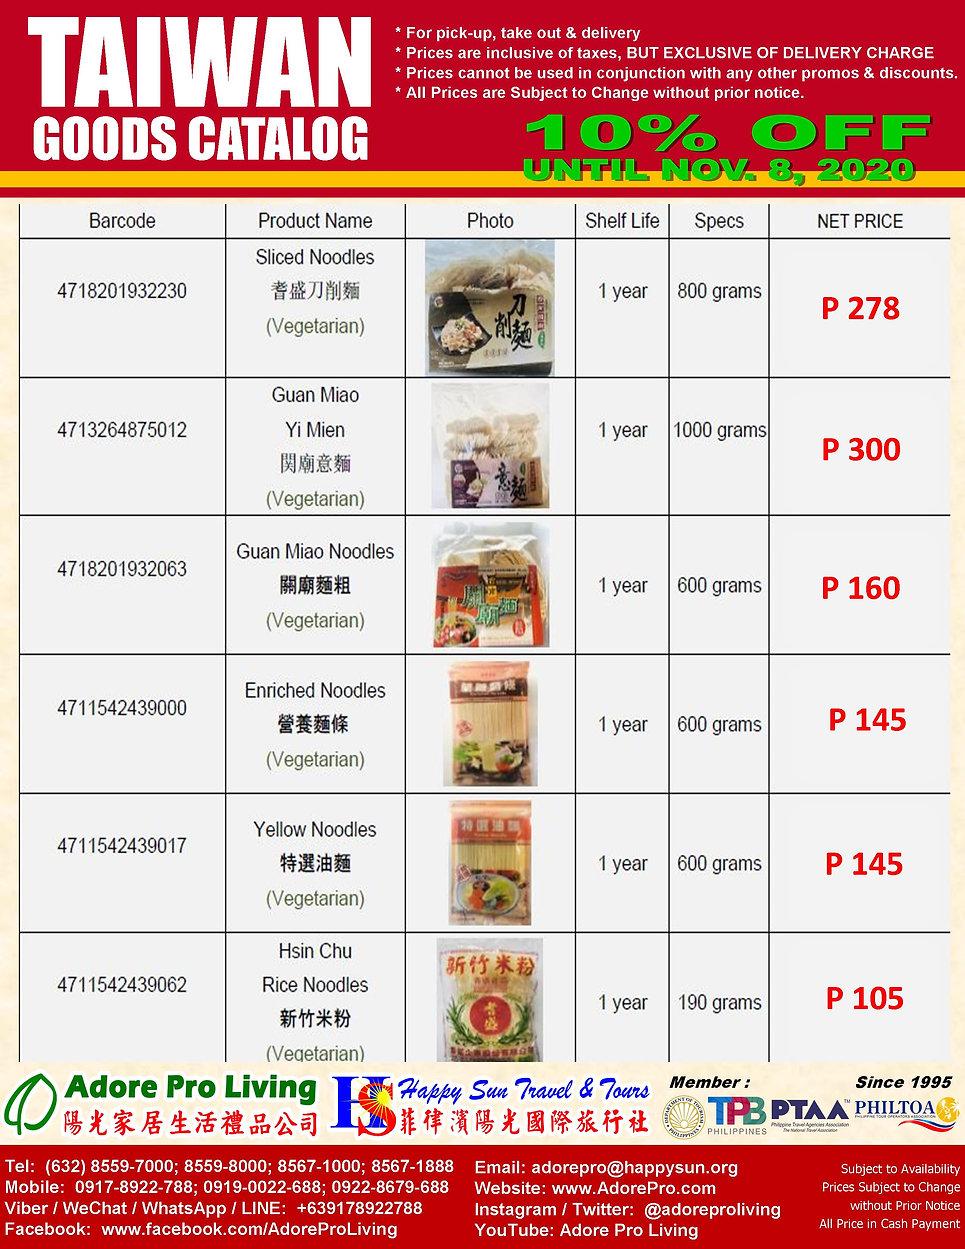 P2.2_2Days10%Off_Valid(Nov08)_TaiwanGood